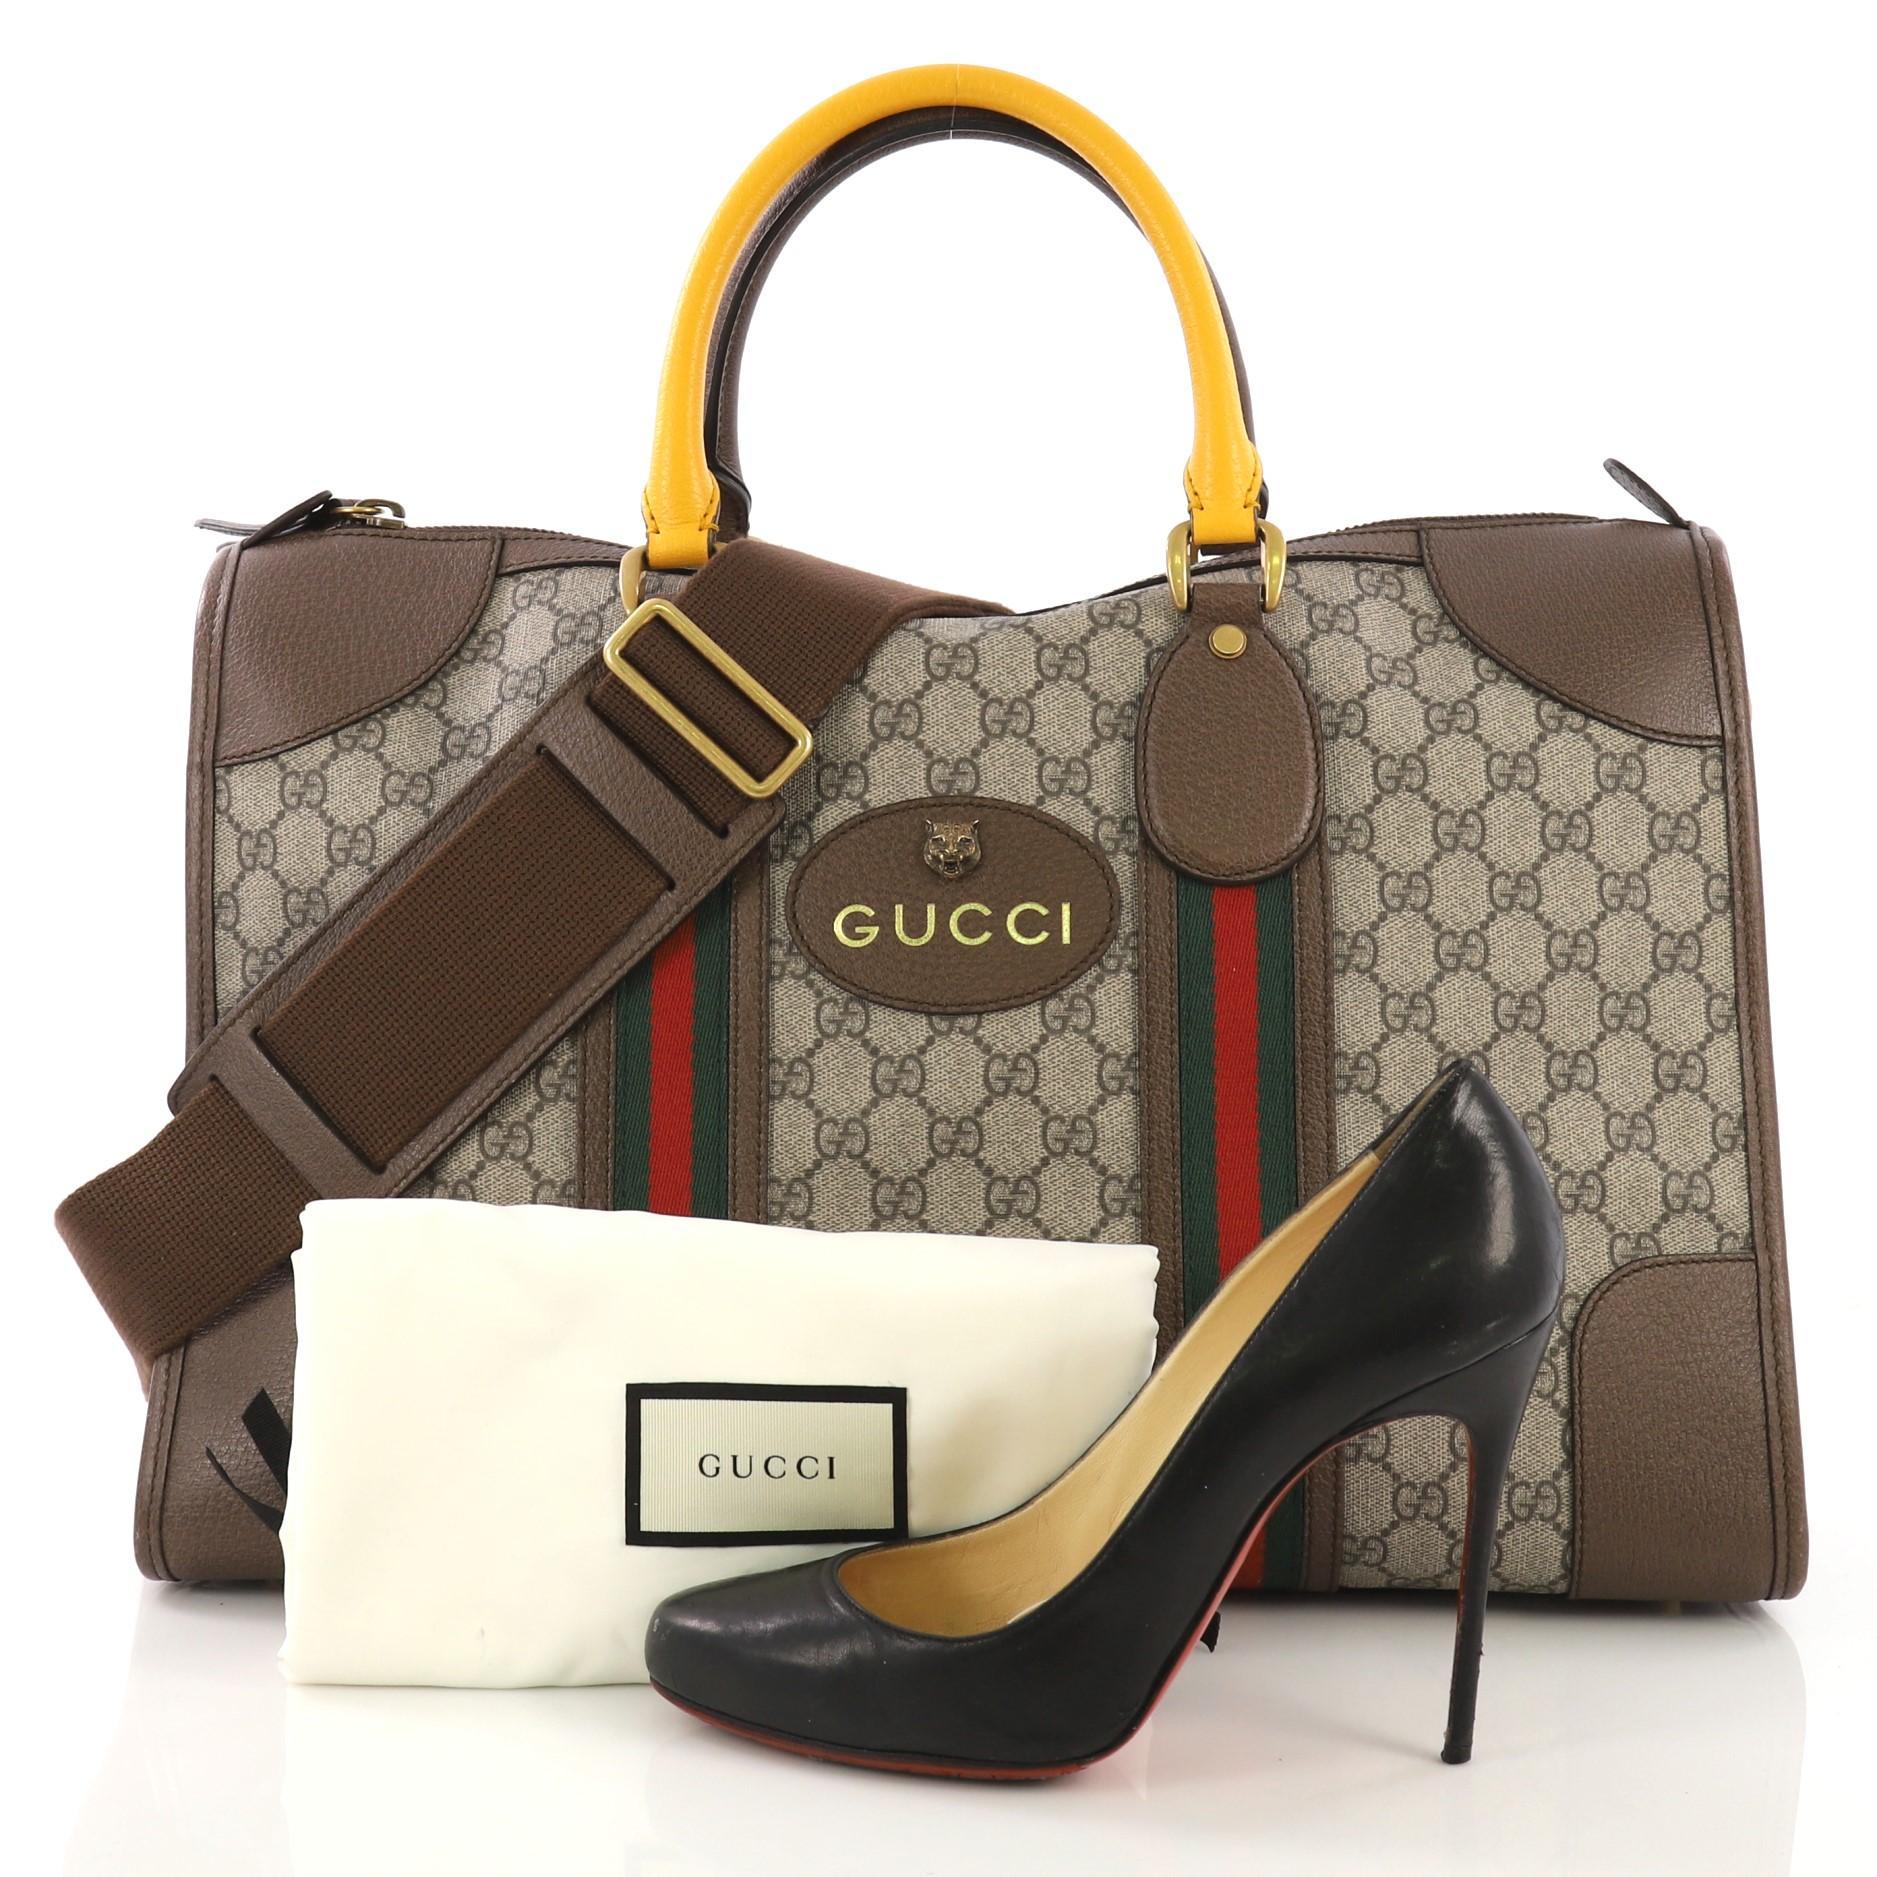 7af2369c7193 Gucci Web Convertible Duffle Bag GG Coated Canvas Medium at 1stdibs